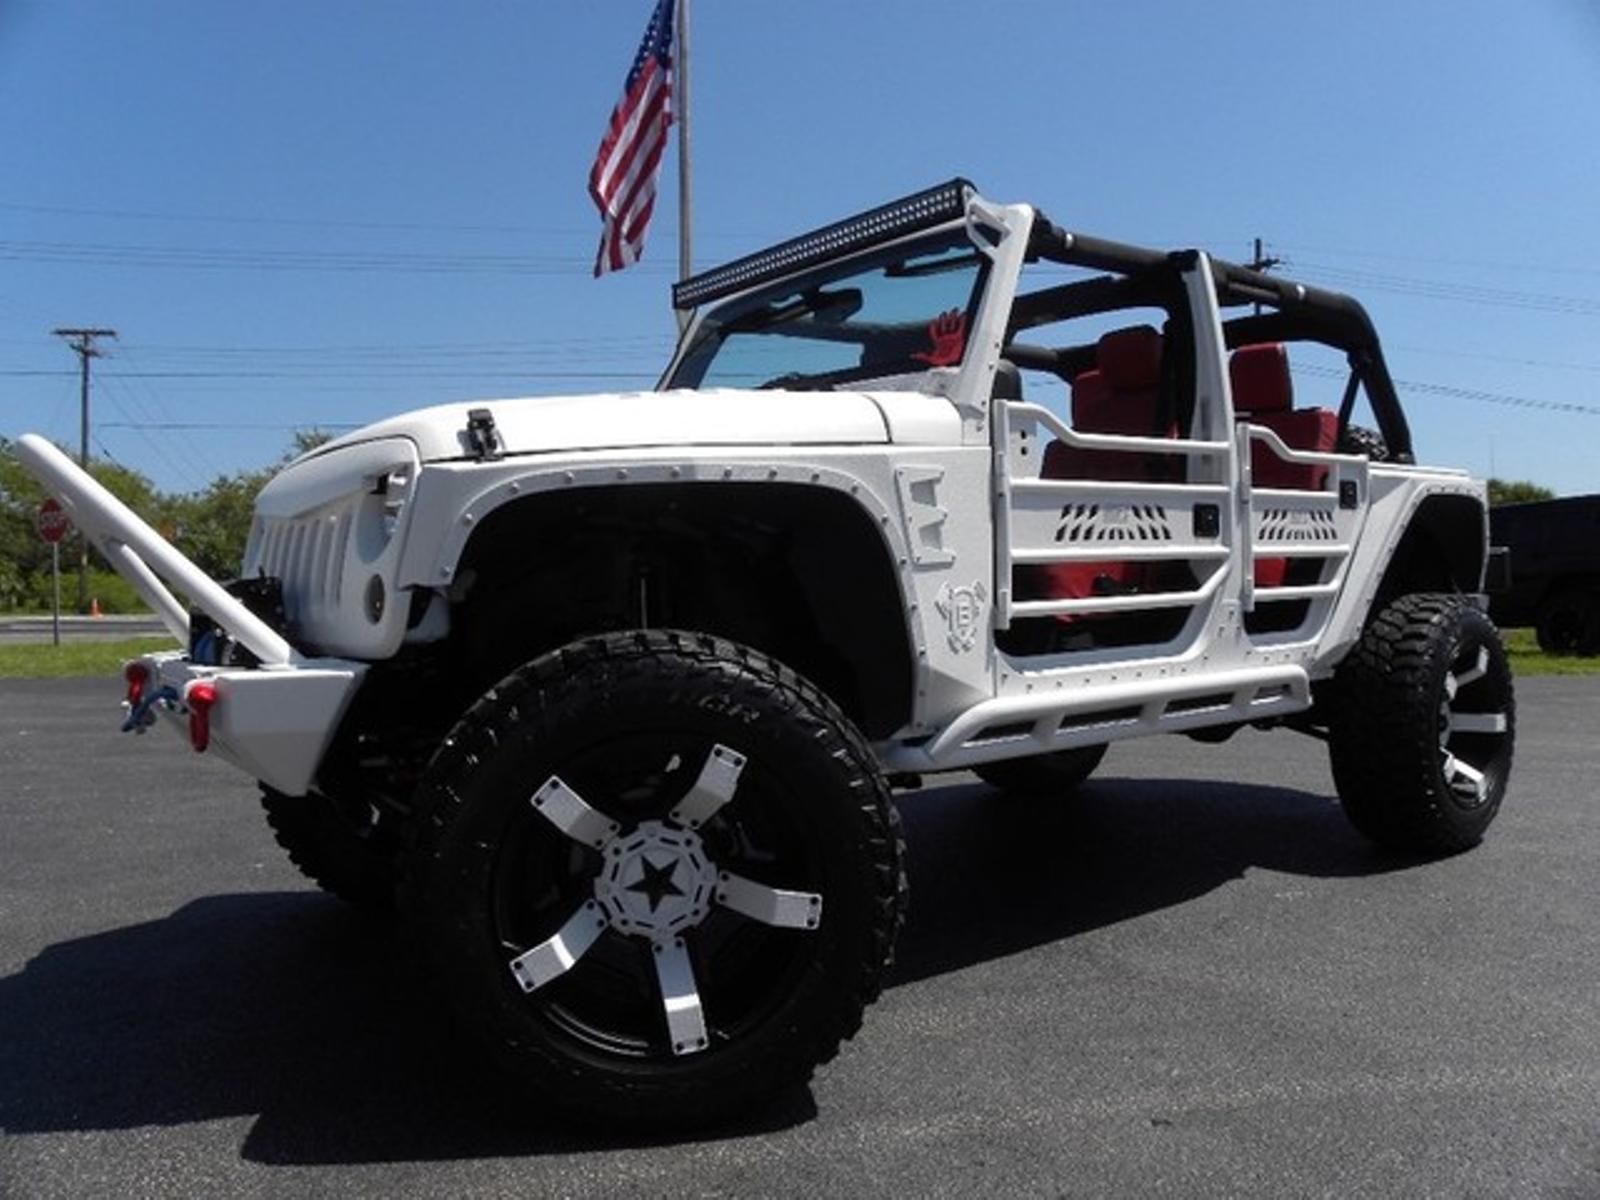 2015 jeep wrangler unlimited iron patriotcustom liftedrockstarsdv8zone florida bayshore automotive. Black Bedroom Furniture Sets. Home Design Ideas